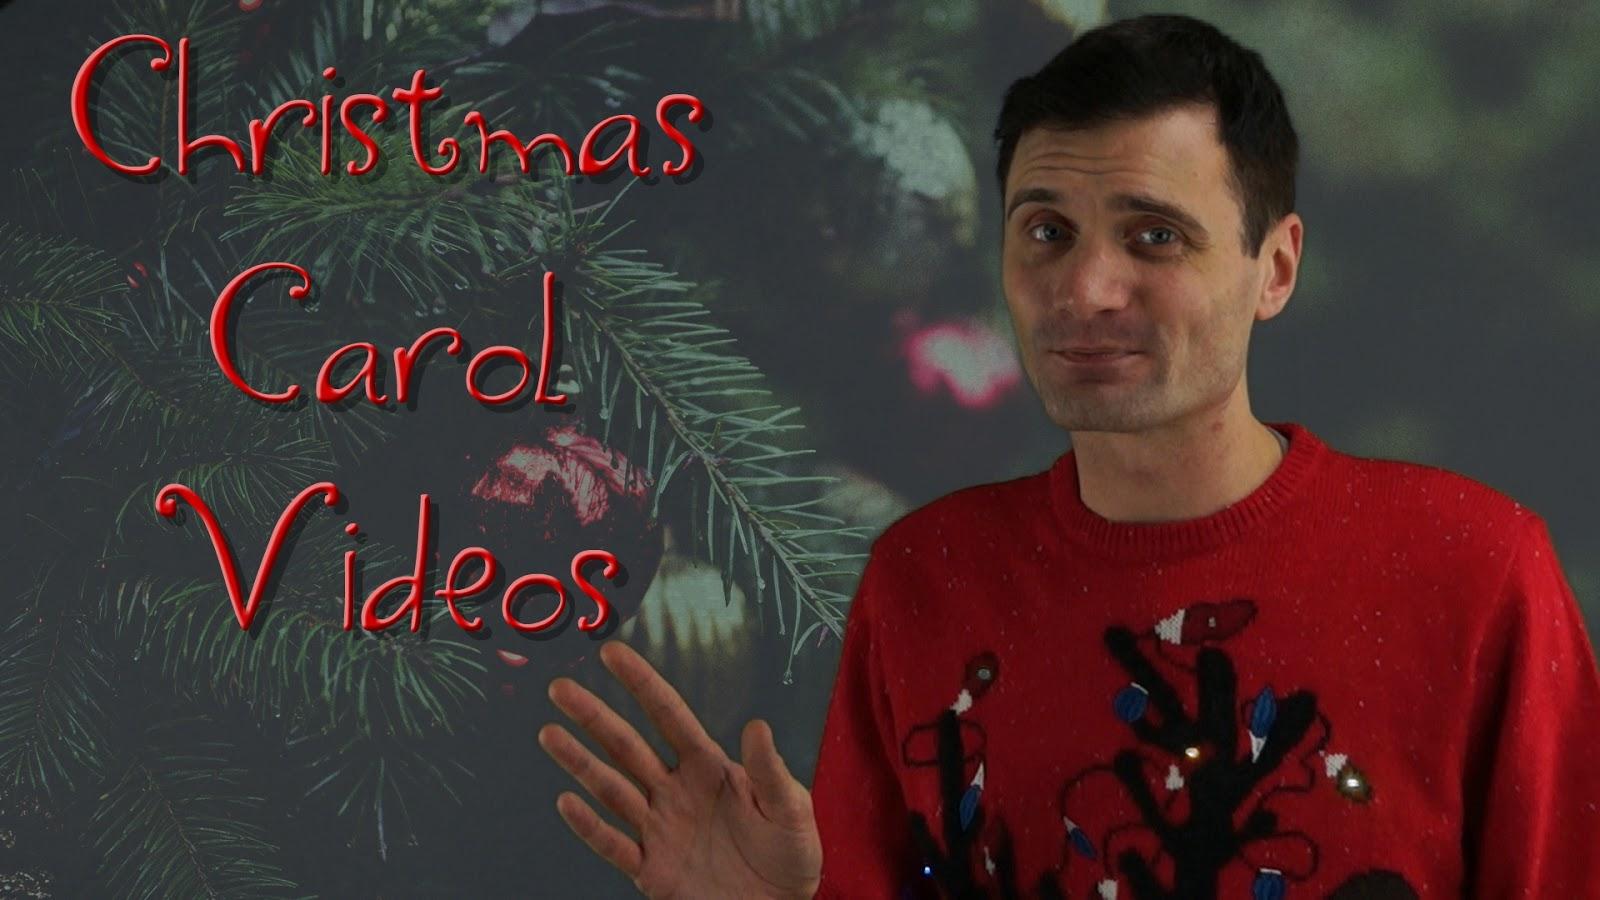 Christmas Carol Gospel Videos - Apostolic Theology